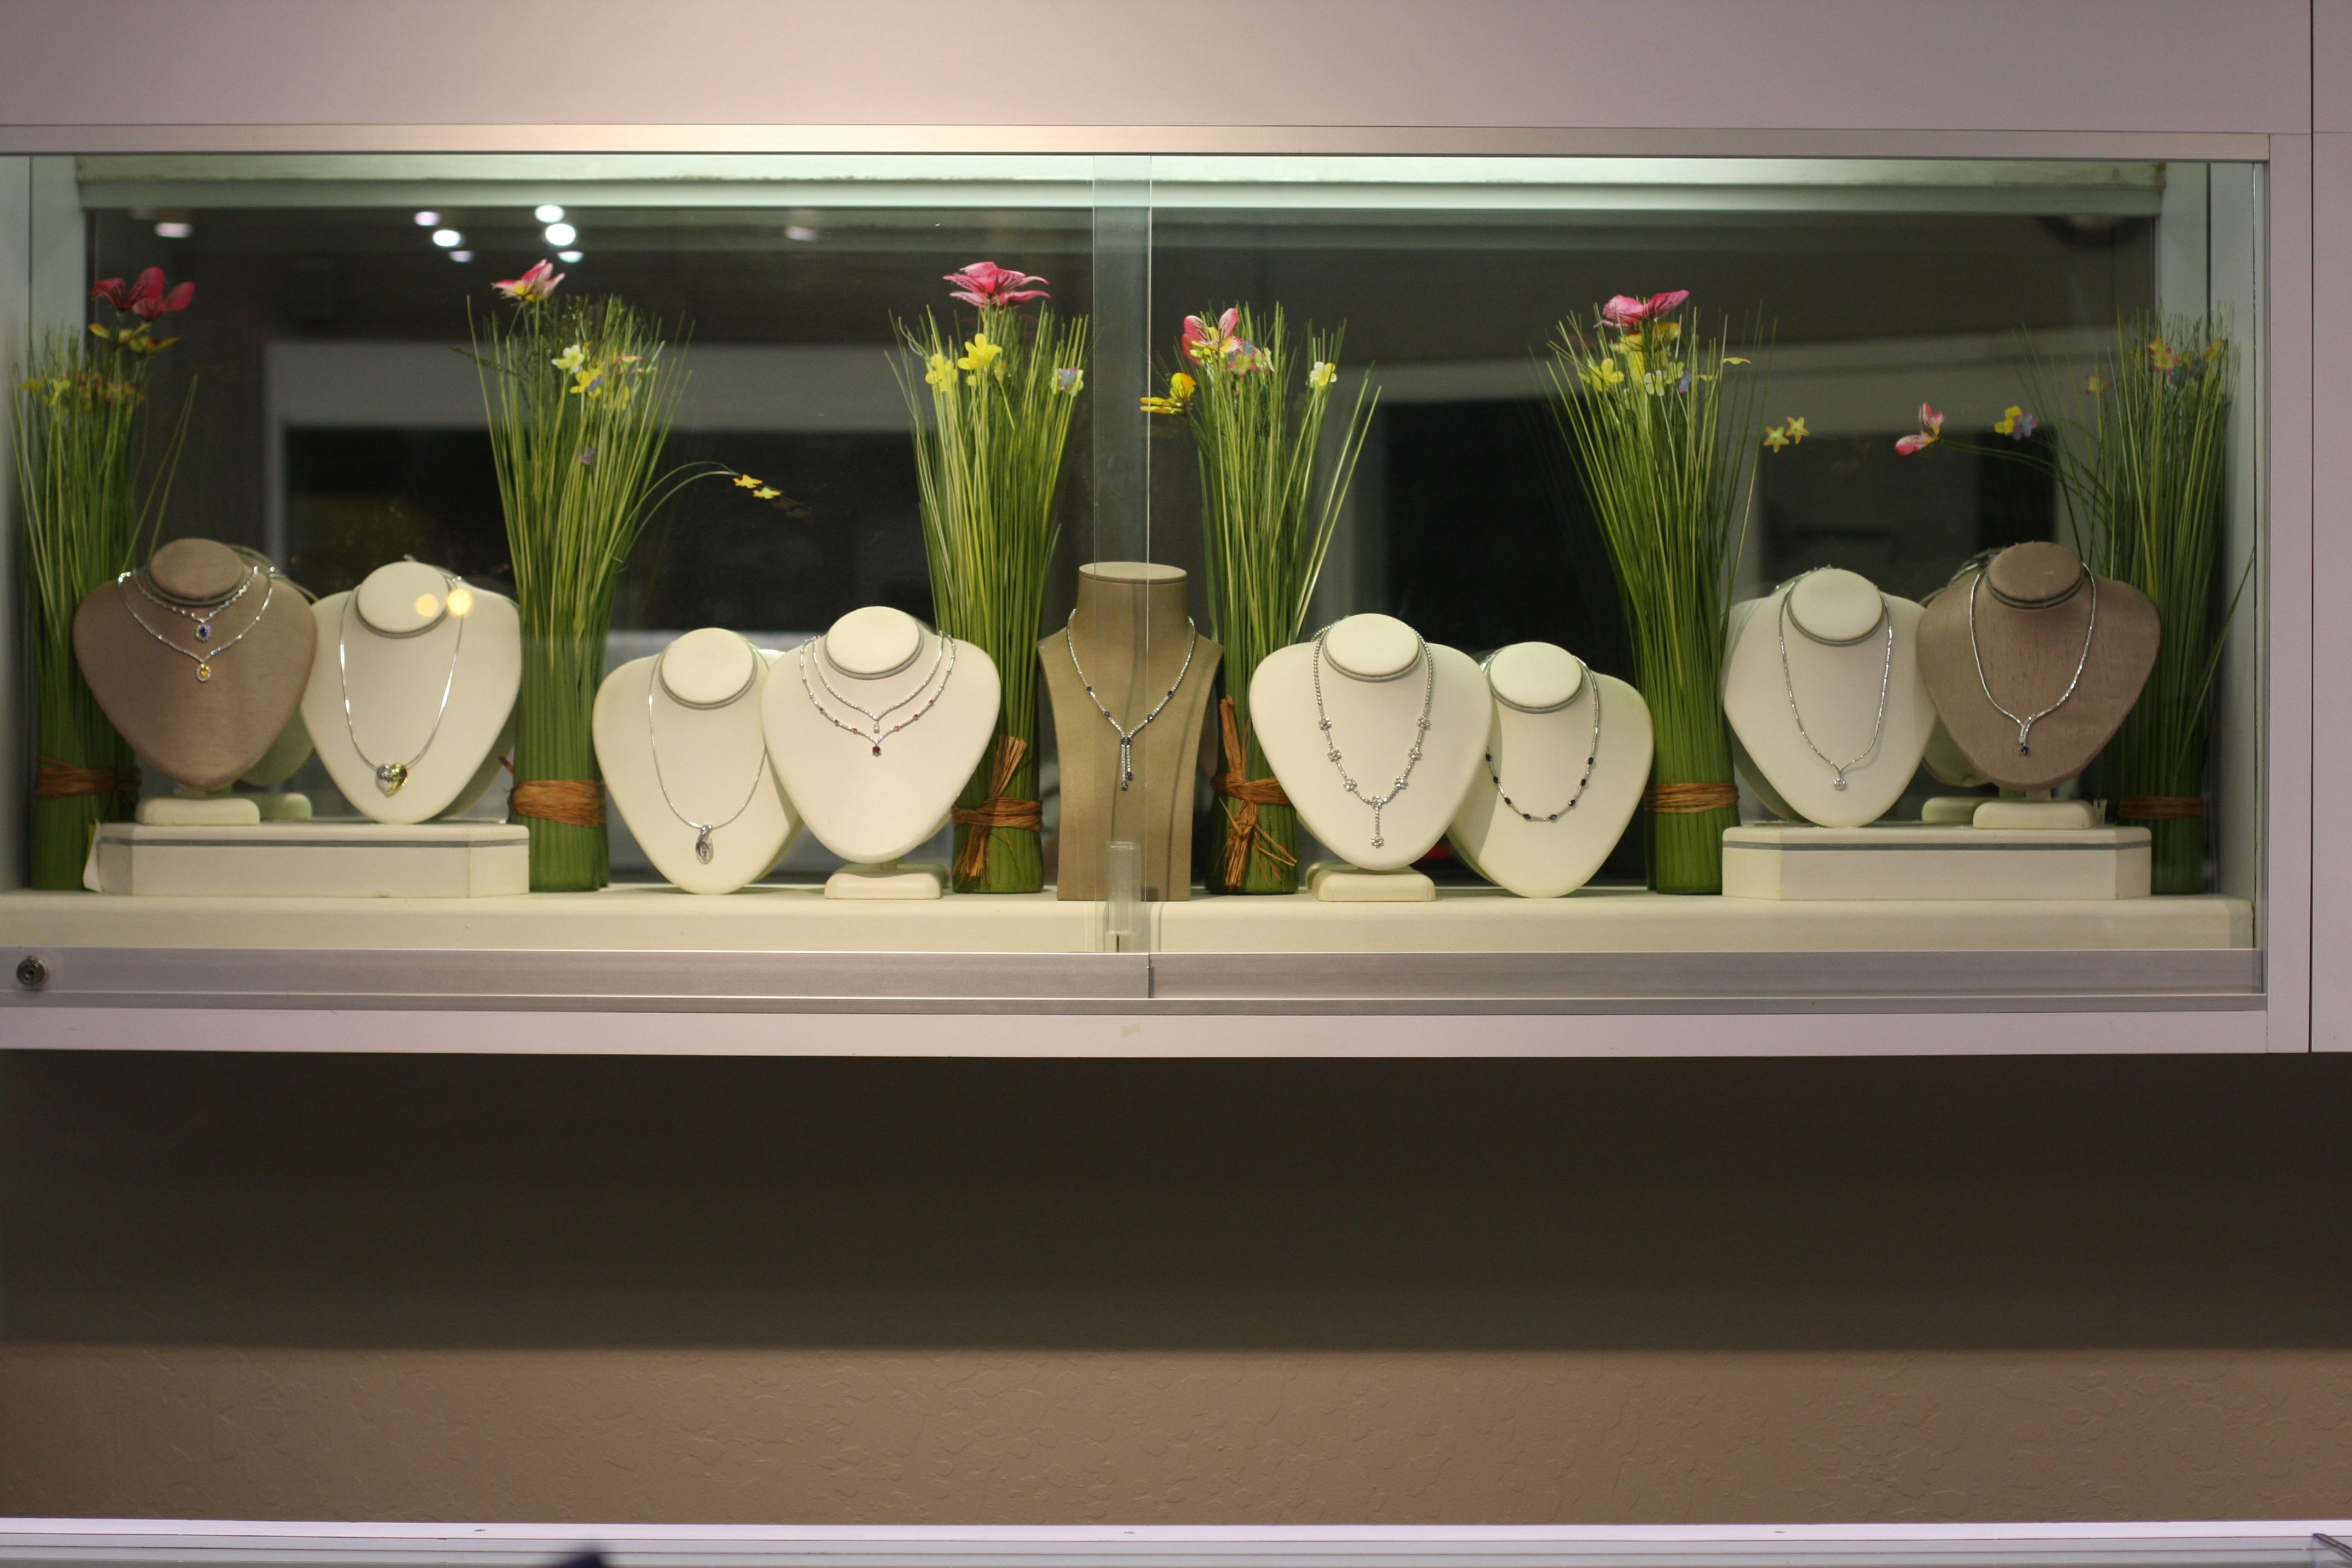 Window display ideas for jewellery  fine jewelry window display  gardening  pinterest  display